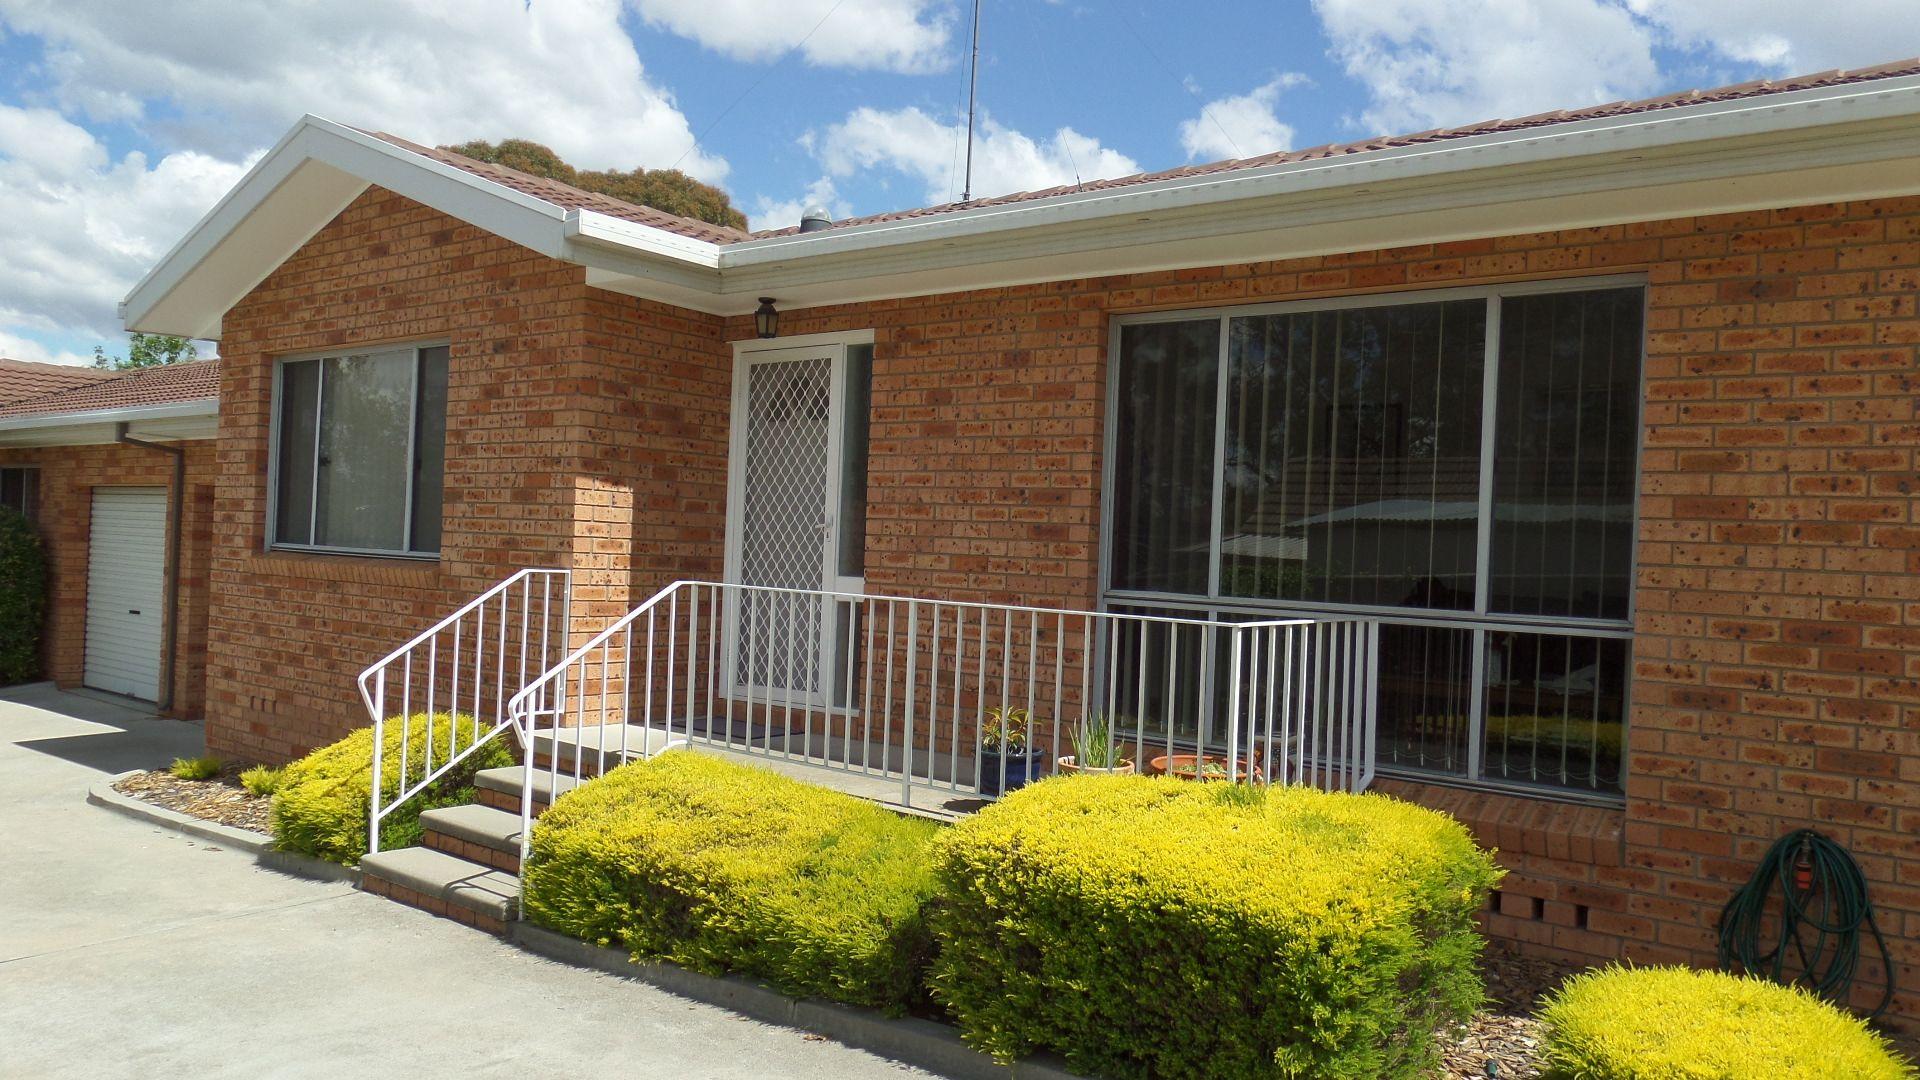 2/20 Blackall Avenue, Queanbeyan NSW 2620, Image 0